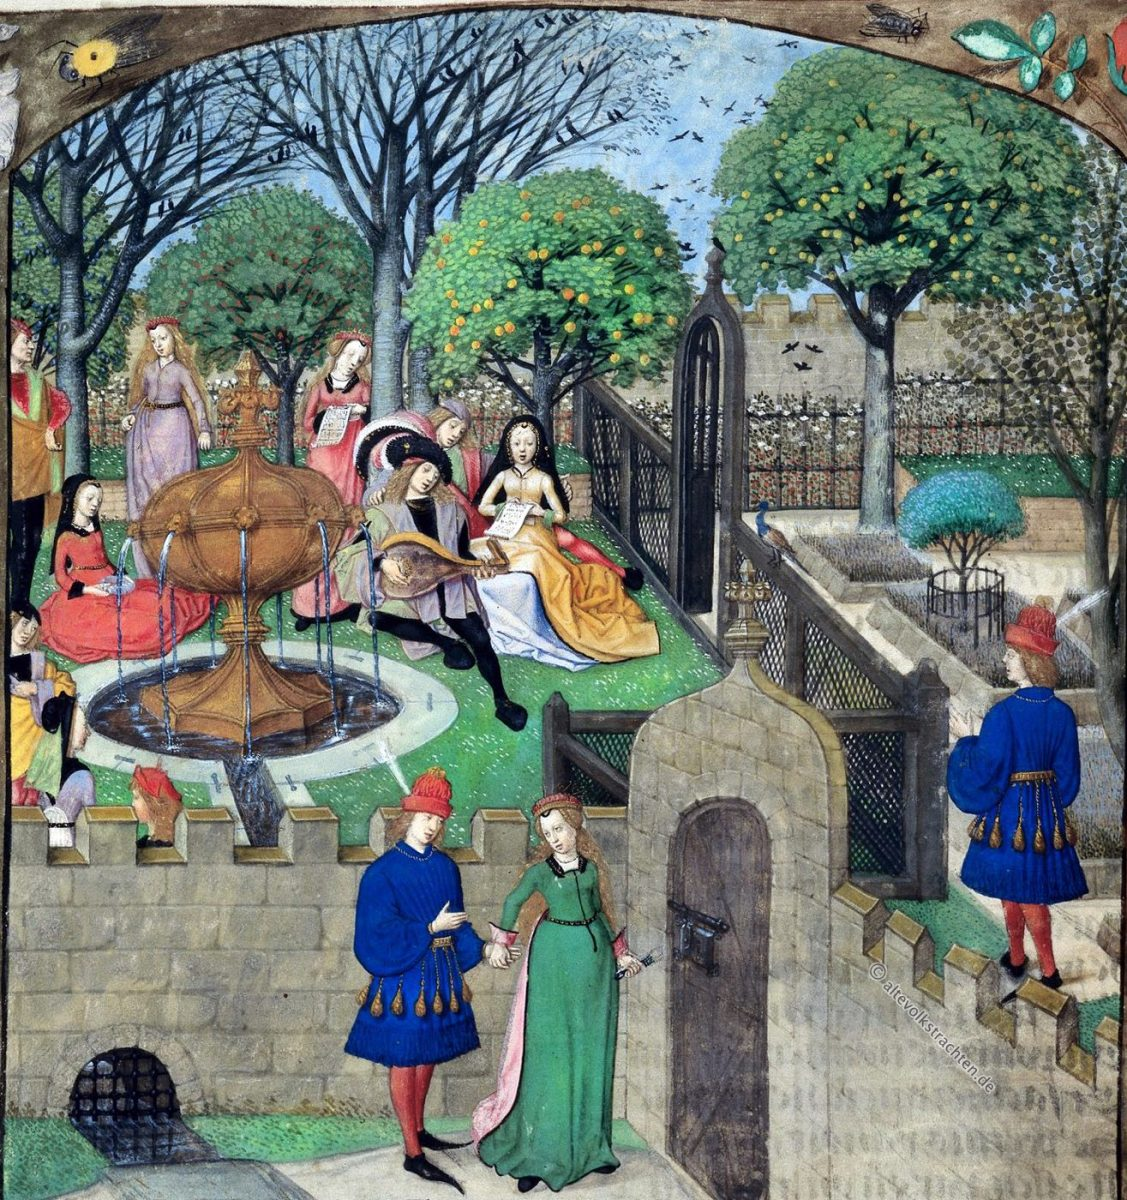 Roman, Rose, Medieval, Garden, Costumes, trompe l'oeil